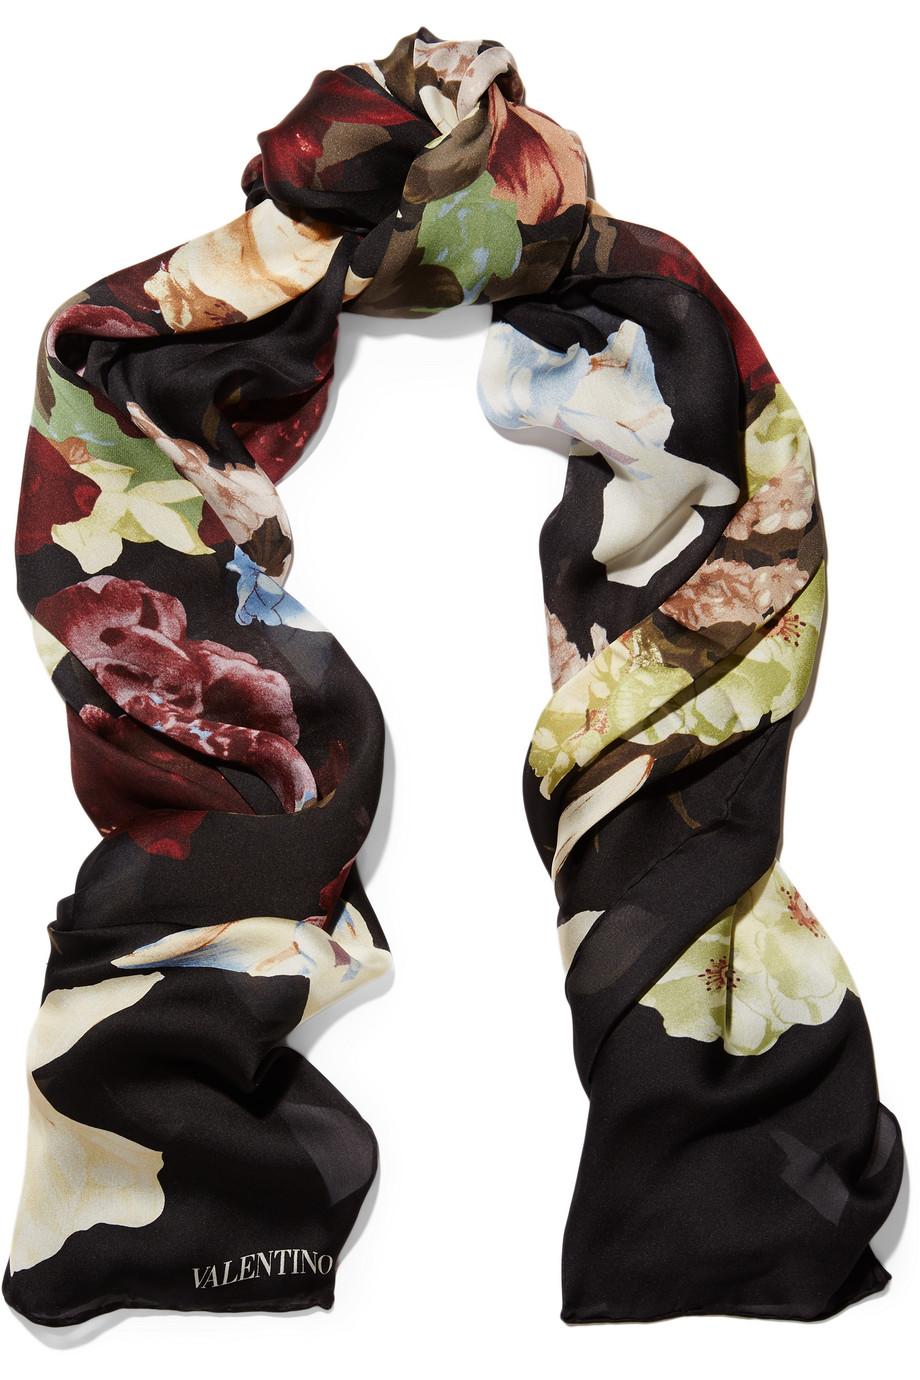 Valentino Floral-Print Silk-Chiffon Scarf, Black, Women's